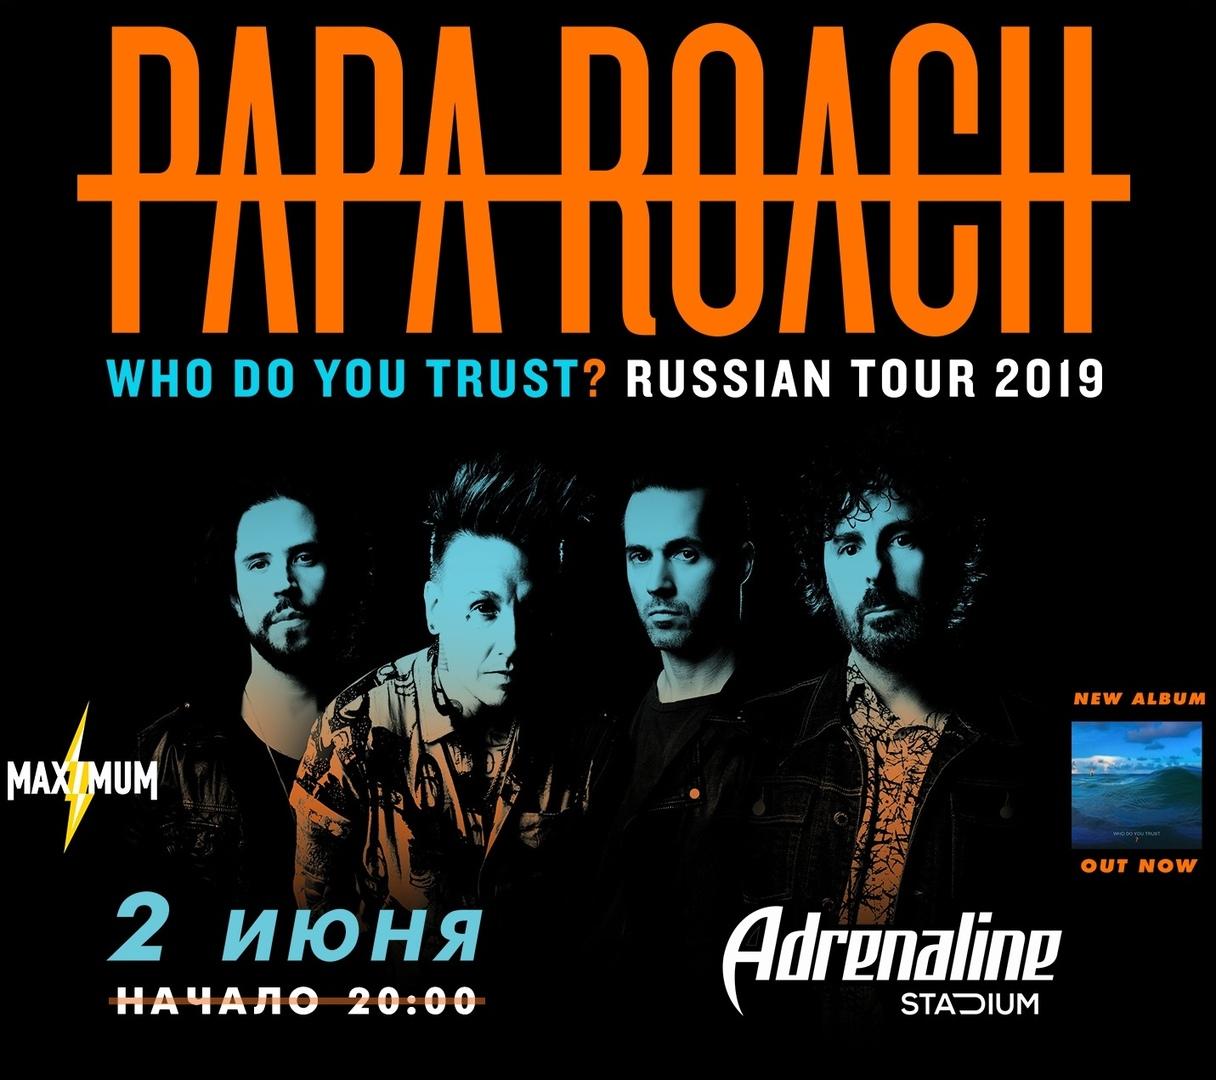 Афиша PAPA ROACH (ТУР РОСТОВ-МОСКВА) 02.06.2019